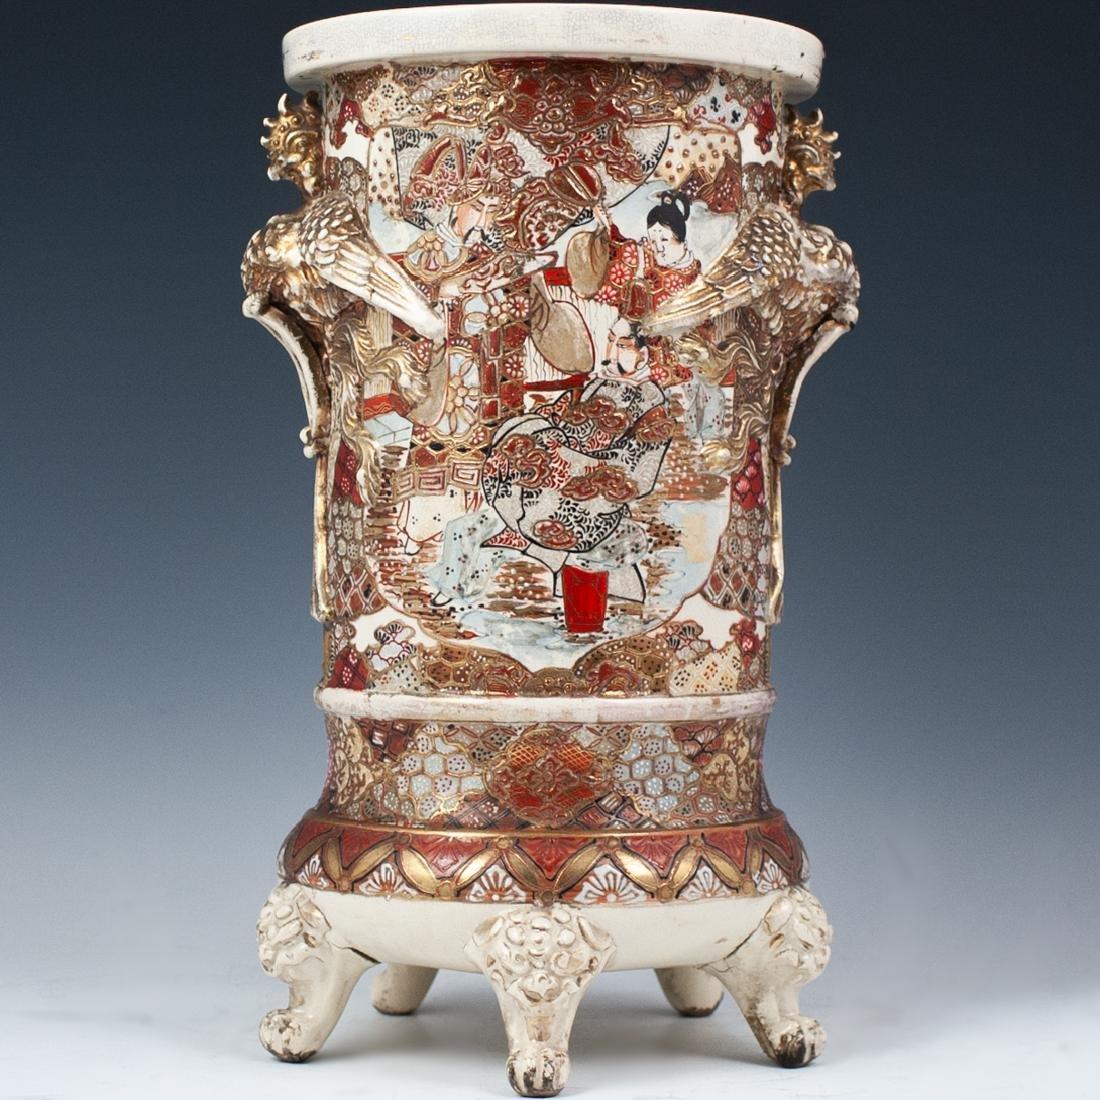 Japanese Porcelain Satsuma Ikebana Vase